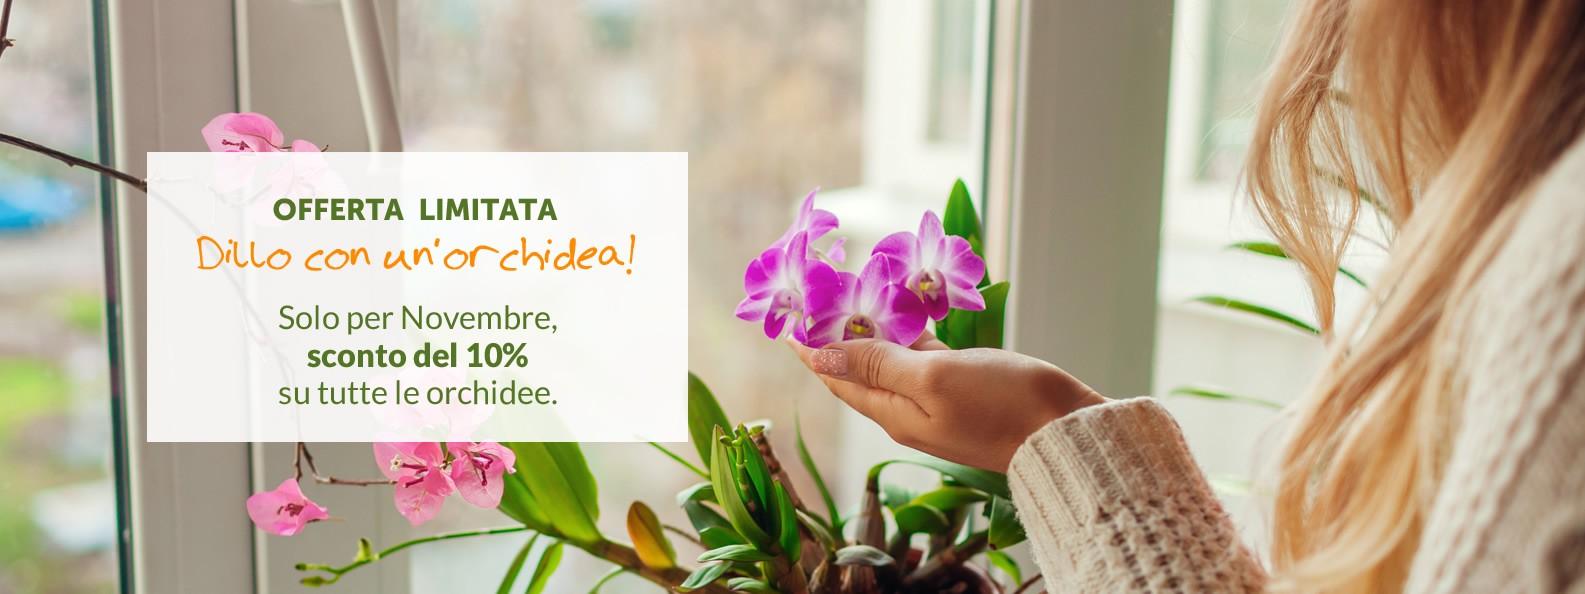 Promo Orchidee